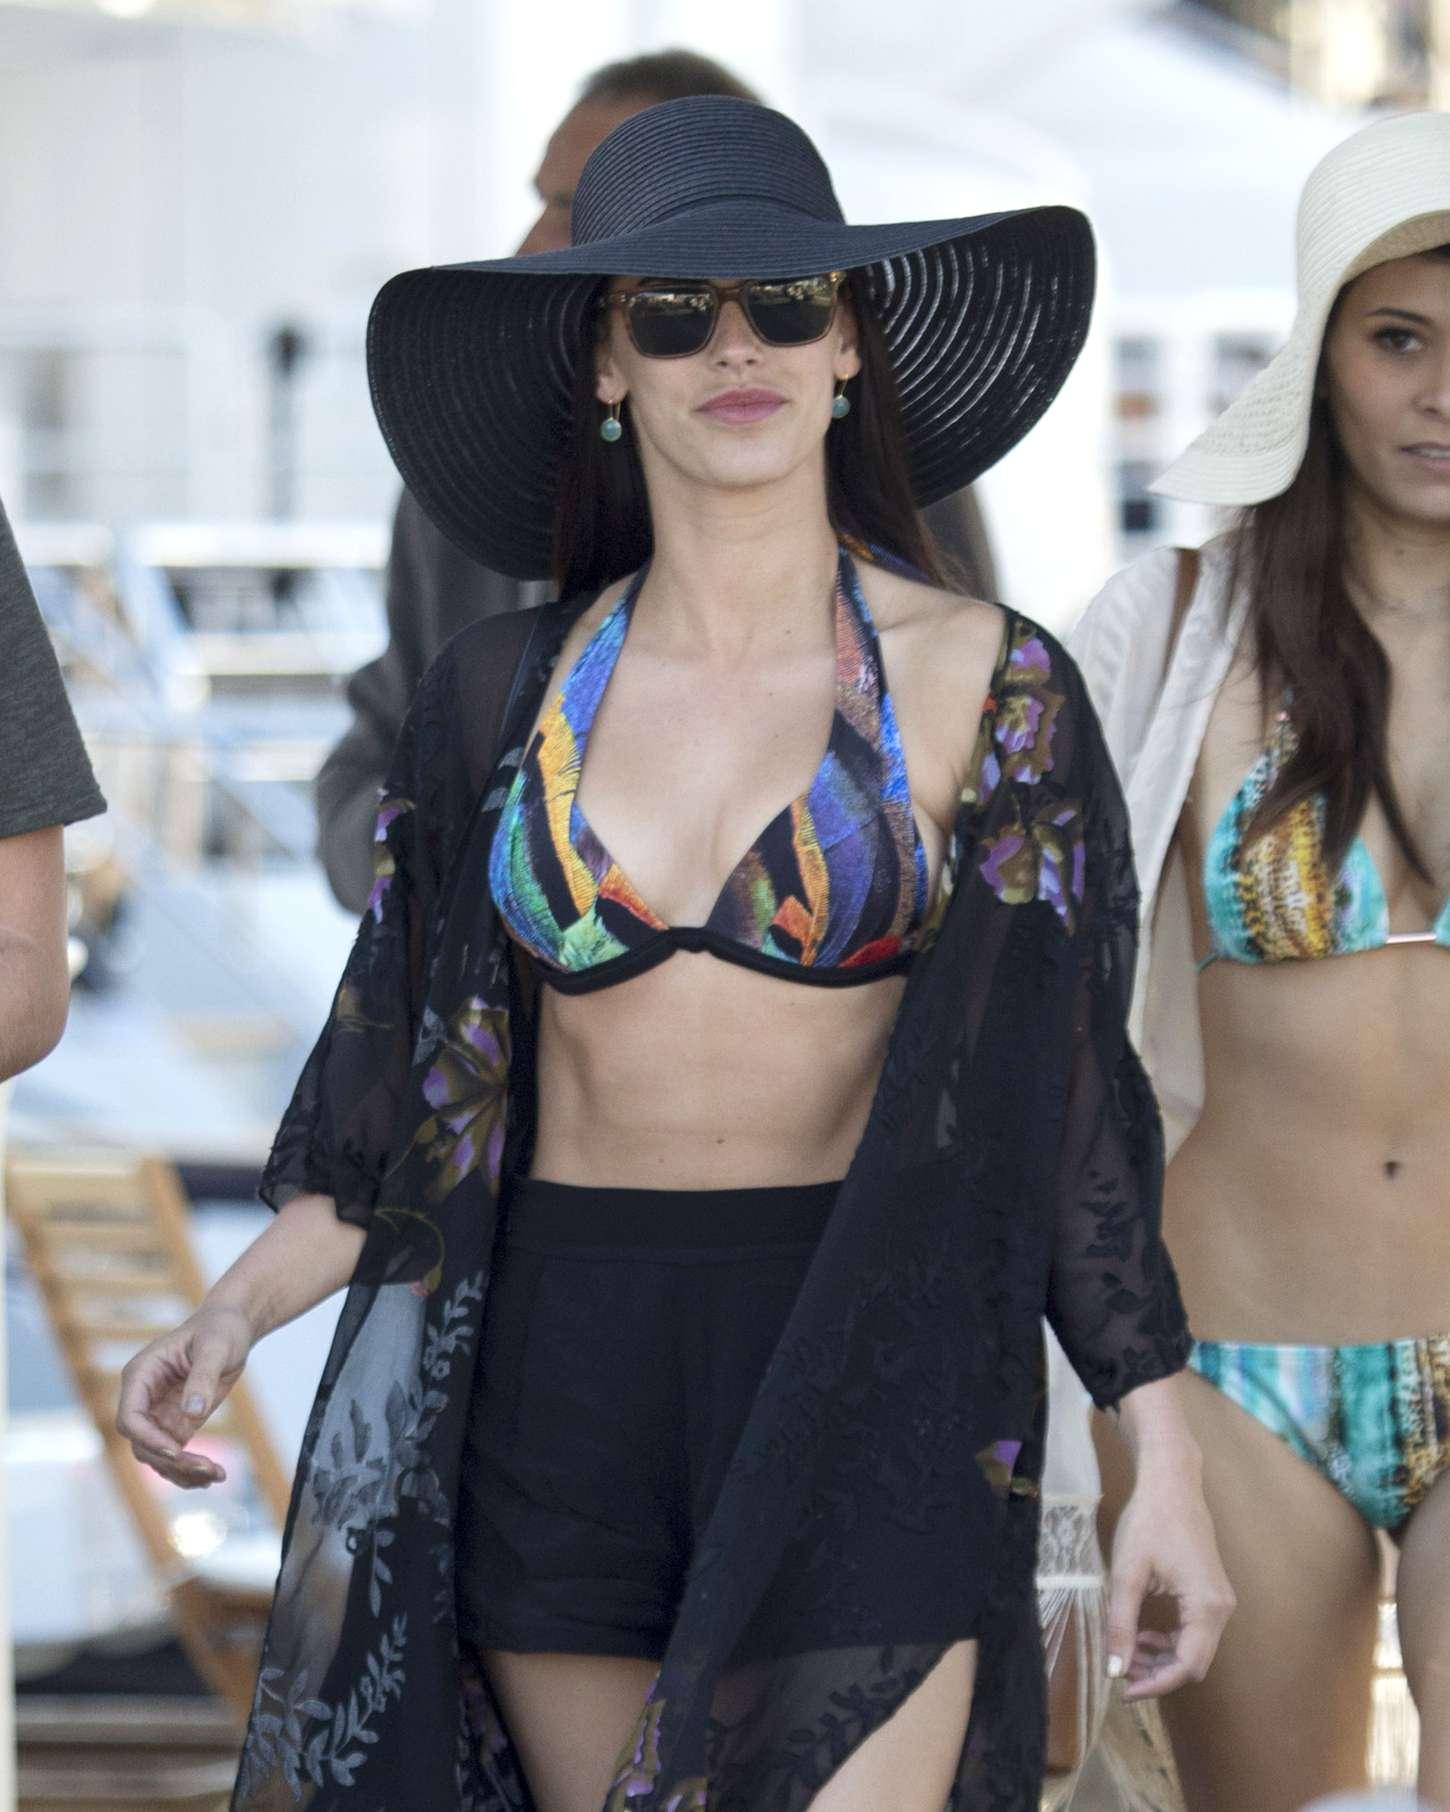 Jessica-Lowndes-in-Bikini-Top--02.jpg